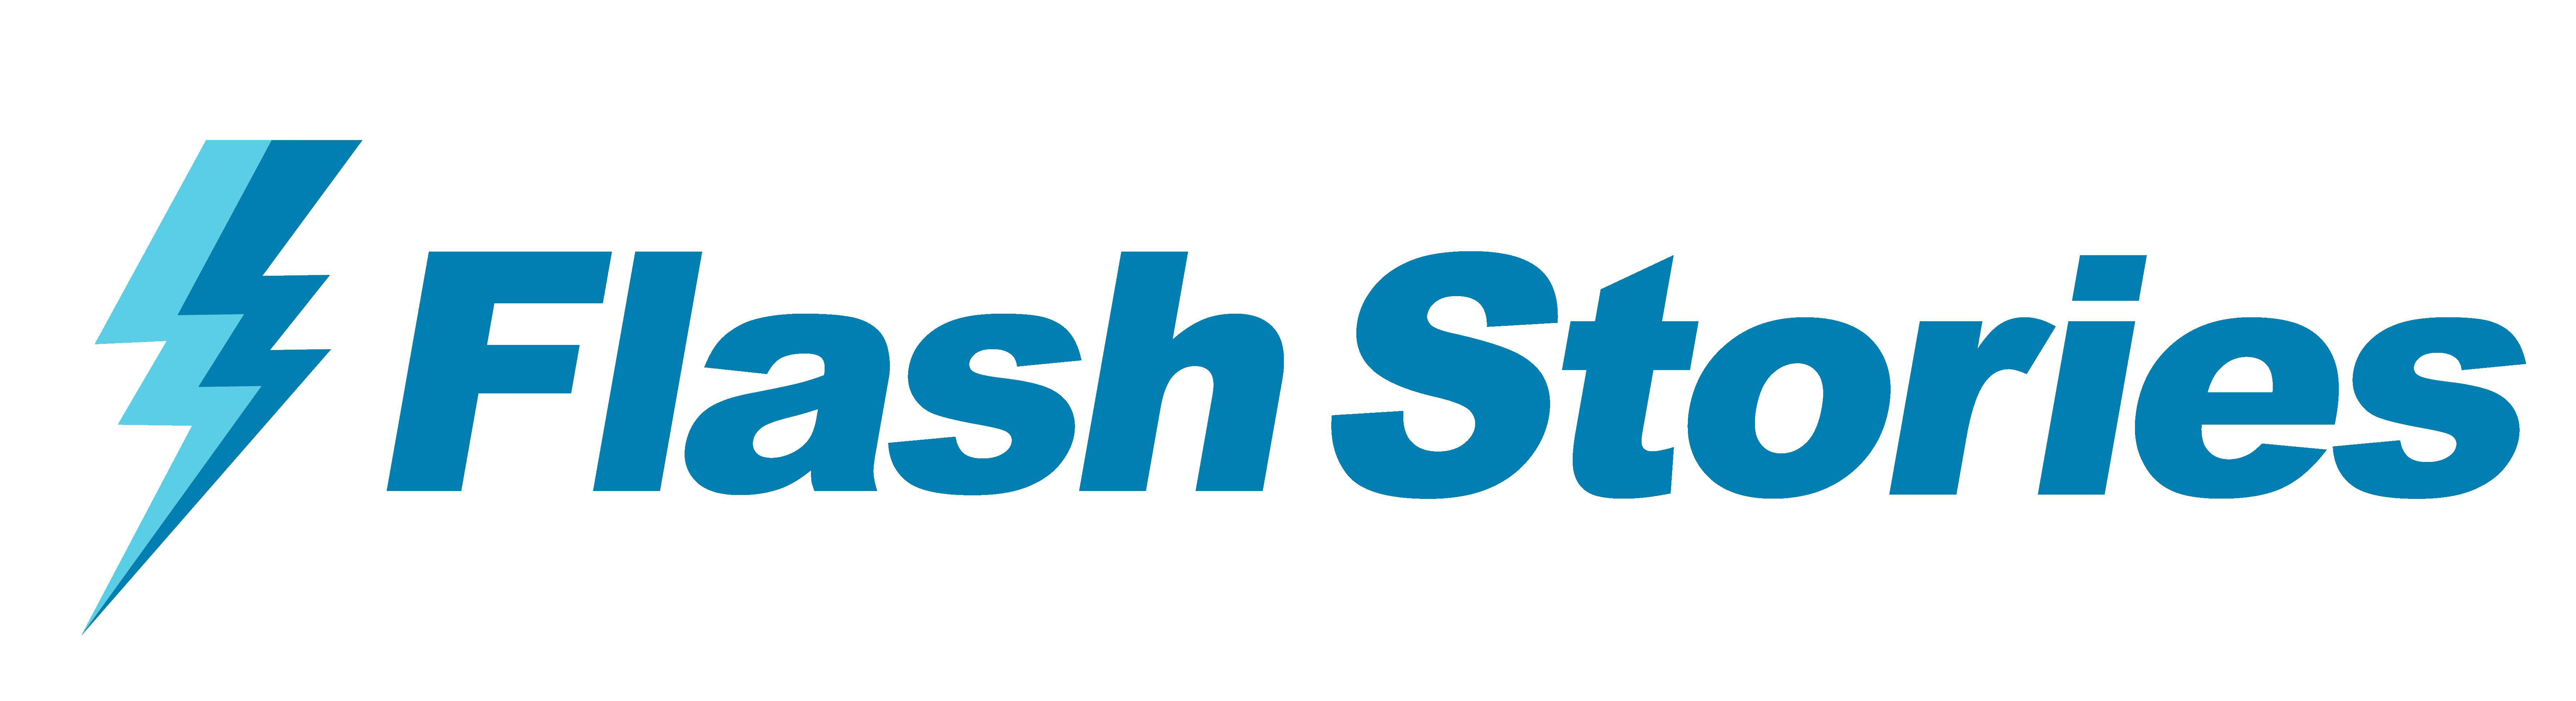 AMP Stories 線上編輯器 | Flash Stories | 好事發生數位